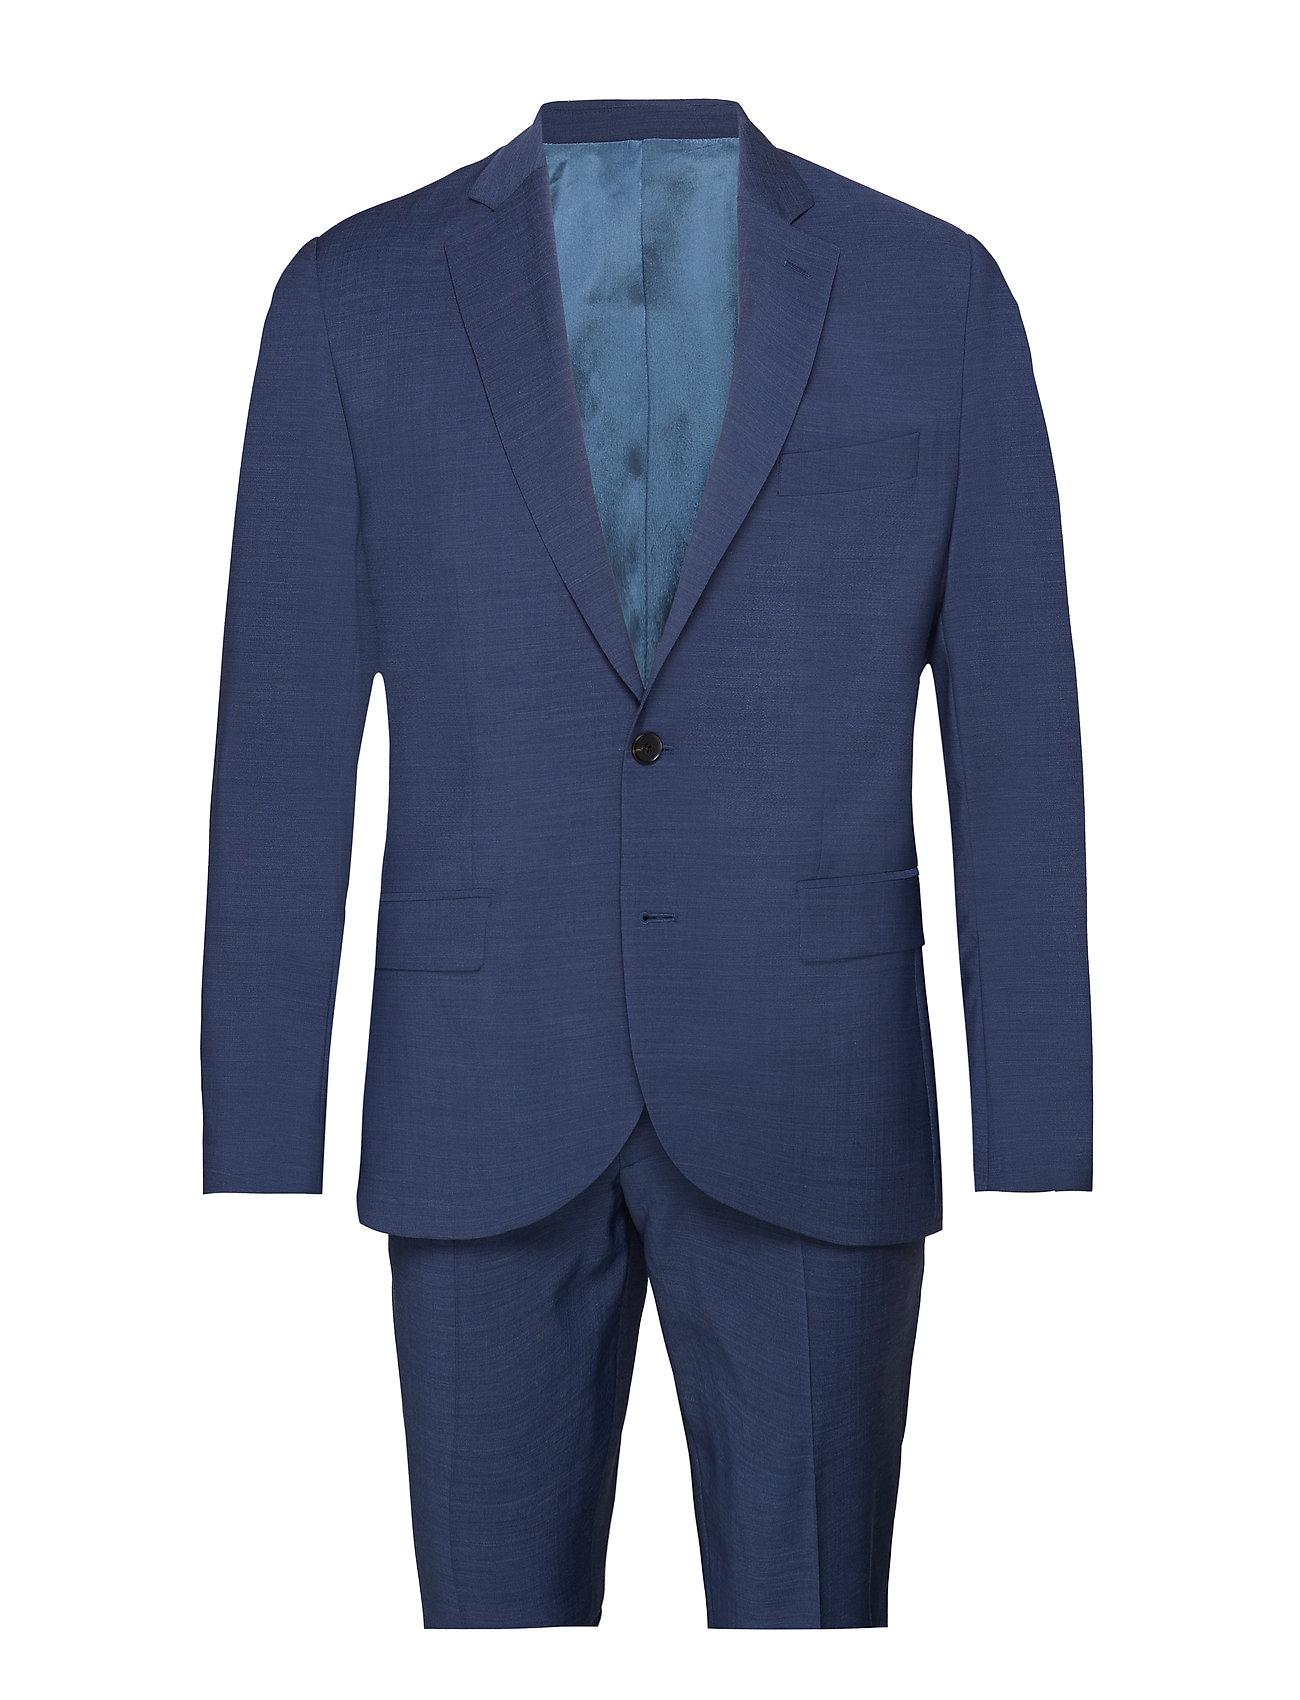 J. Lindeberg Hopper Soft/P-Comfort Wool - MID BLUE